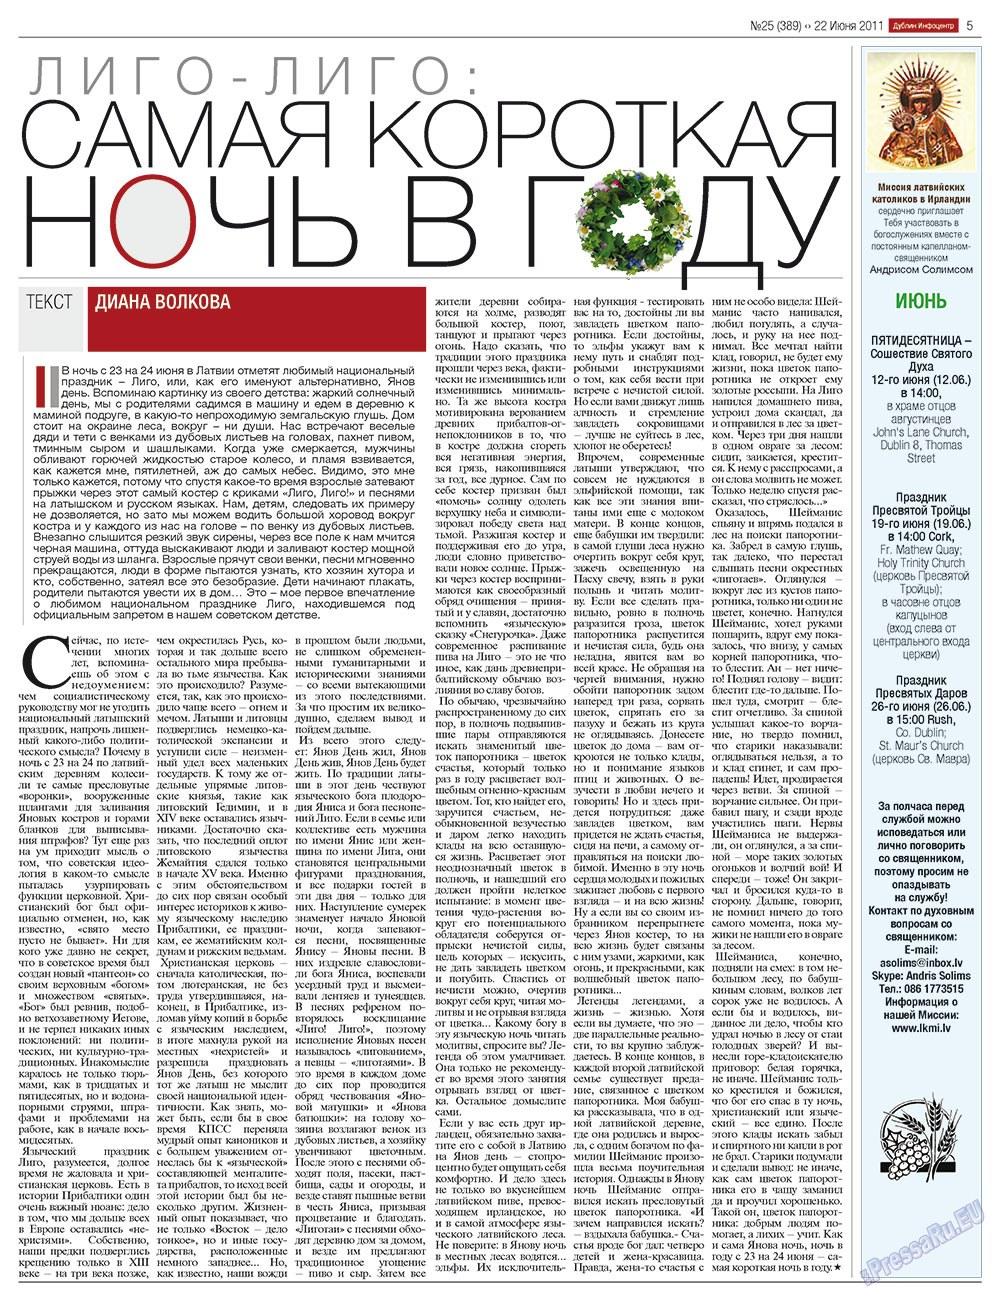 Дублин инфоцентр (газета). 2011 год, номер 25, стр. 5